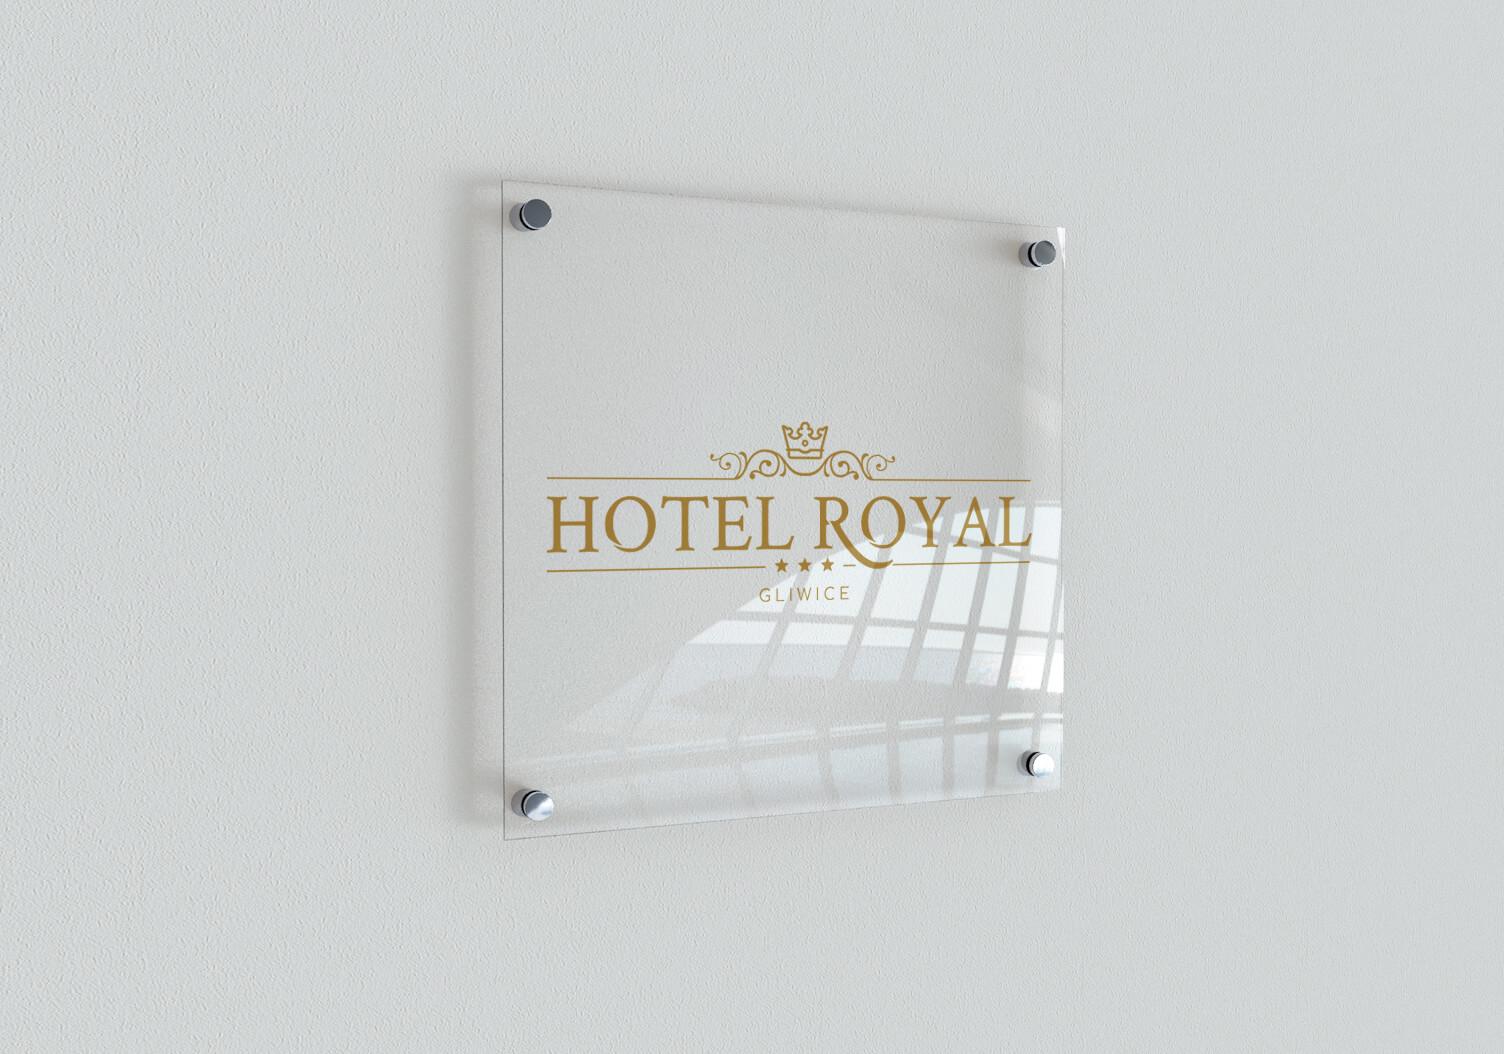 Proejtkowanie logo - branża hotelarska, kleint: Hotel Royal Gliwice